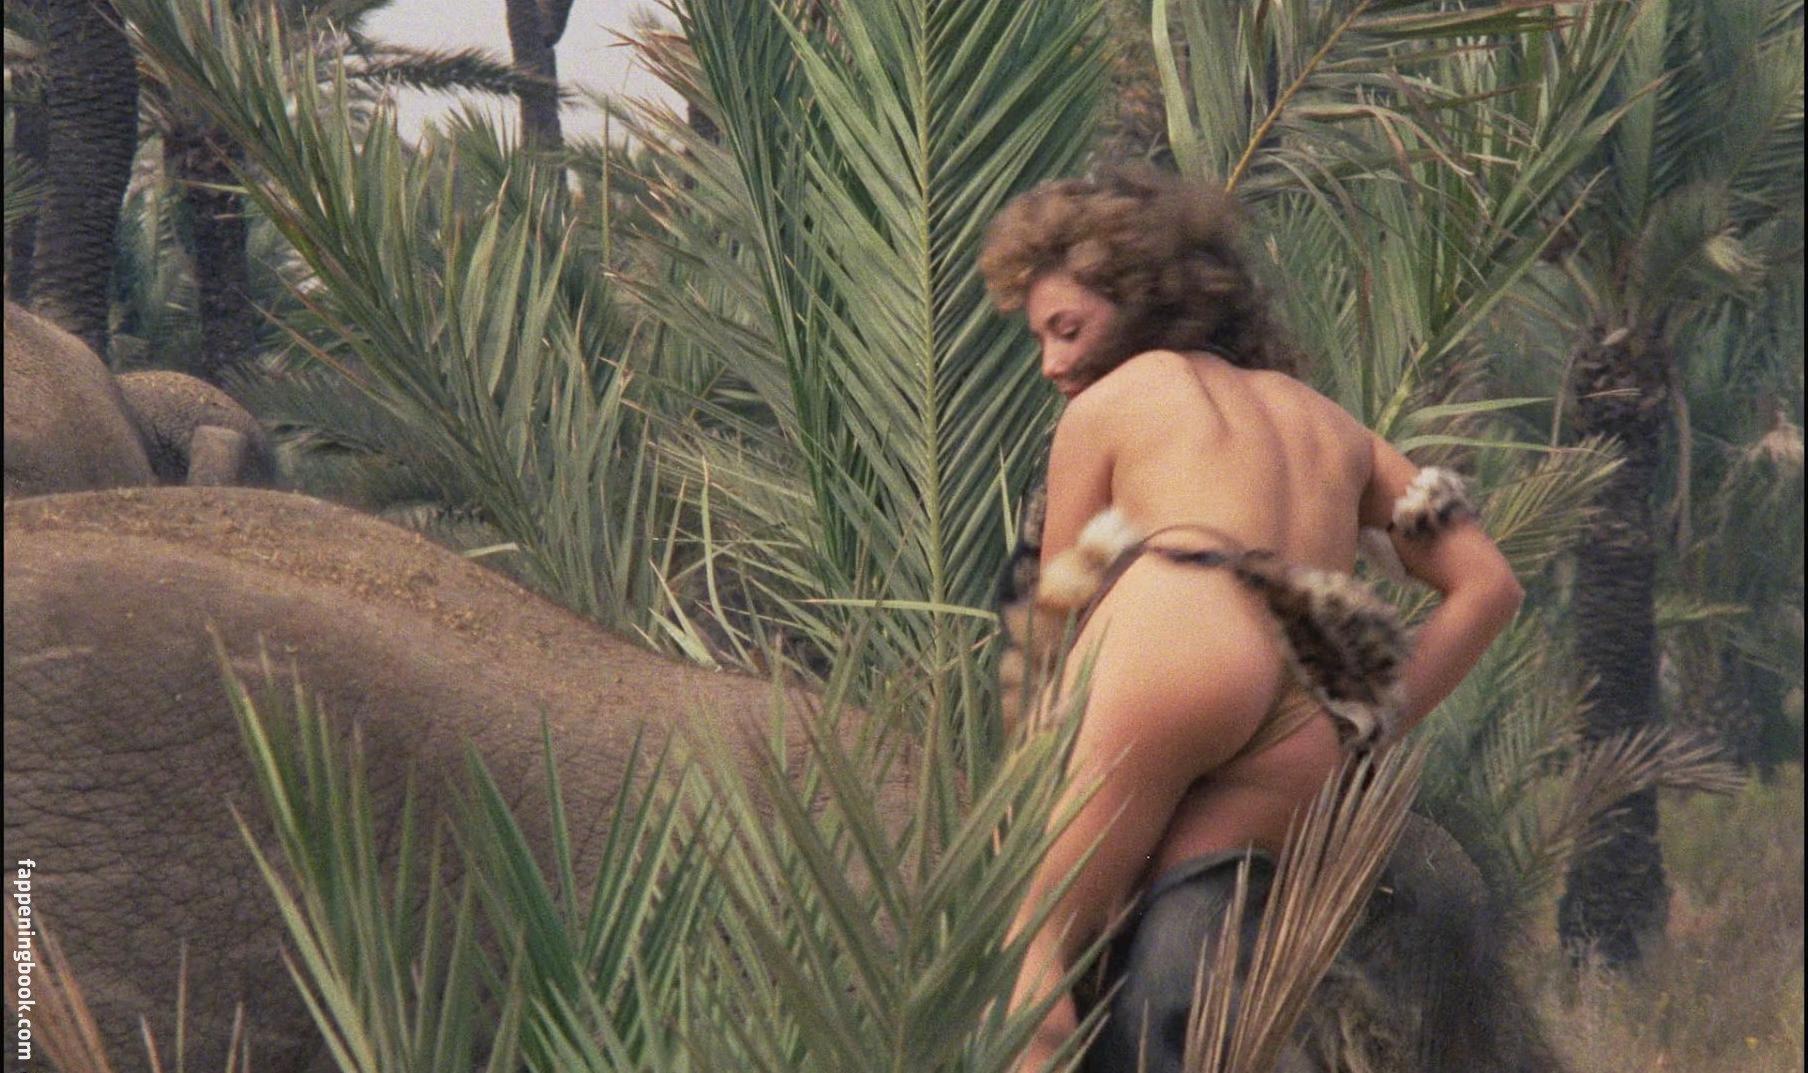 Heidi Brühl Nude analía ivars nude, sexy, the fappening, uncensored - photo